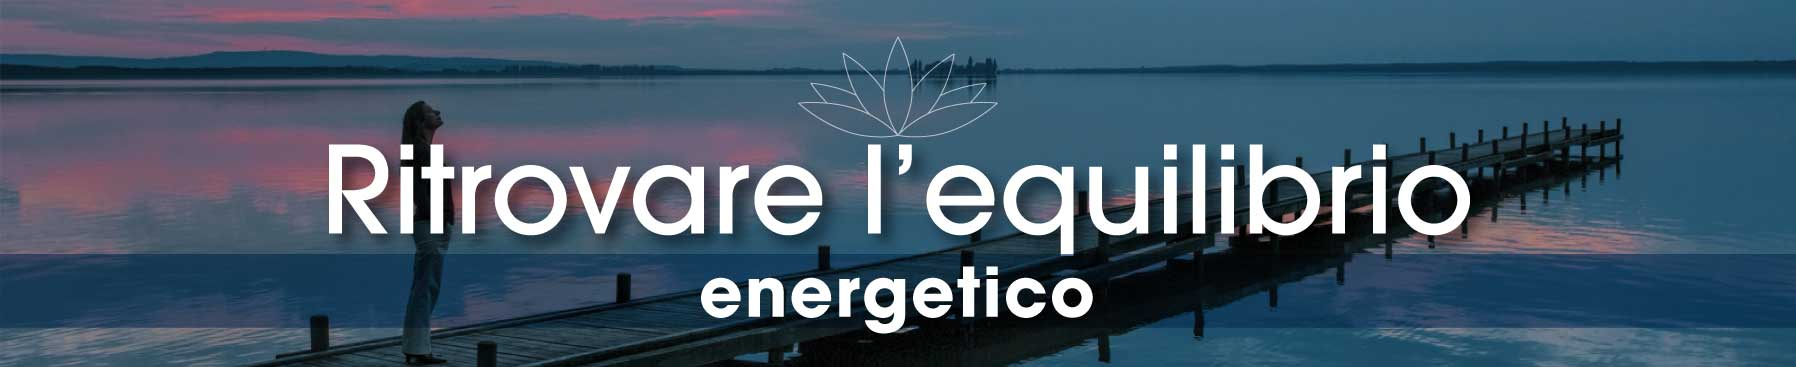 https://meditaedanza.com/wp-content/uploads/2020/12/equilibrio-energetico.jpg